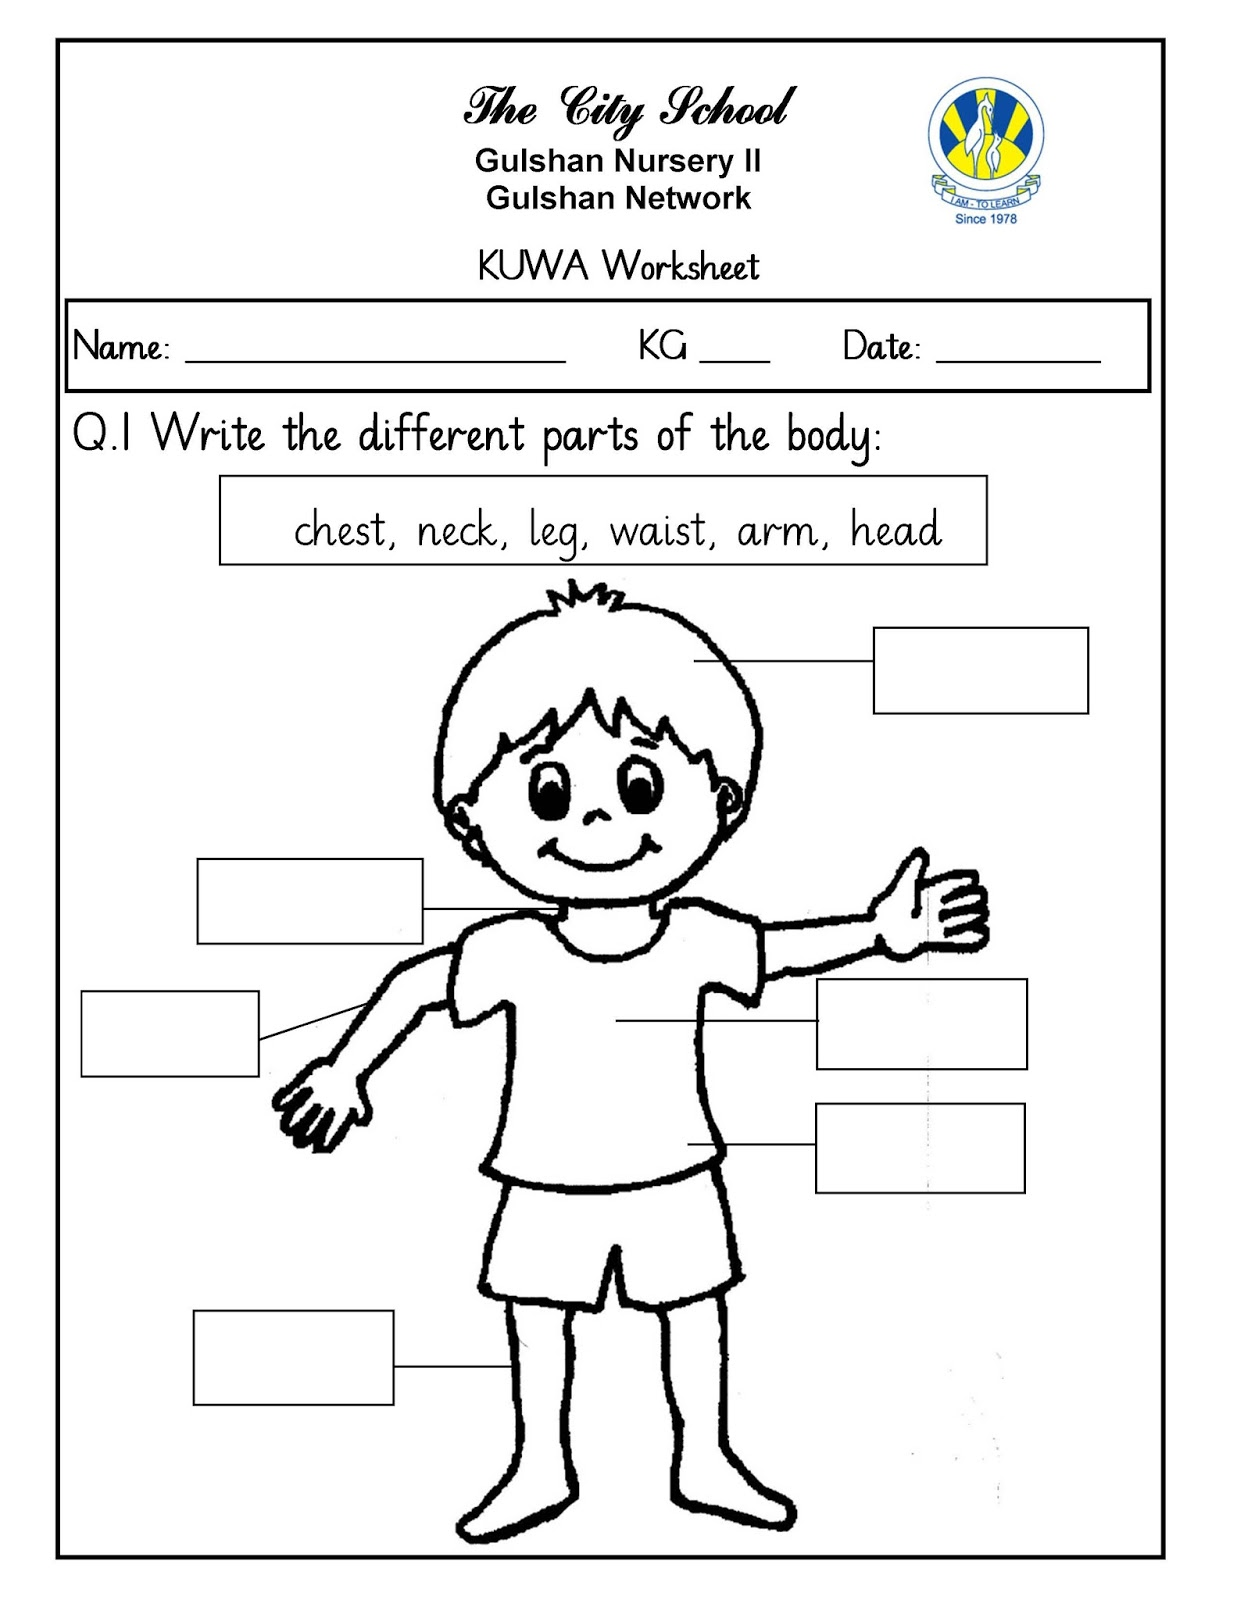 Sr Gulshan The City Nursery Ii Kuwa English And Urdu Worksheets